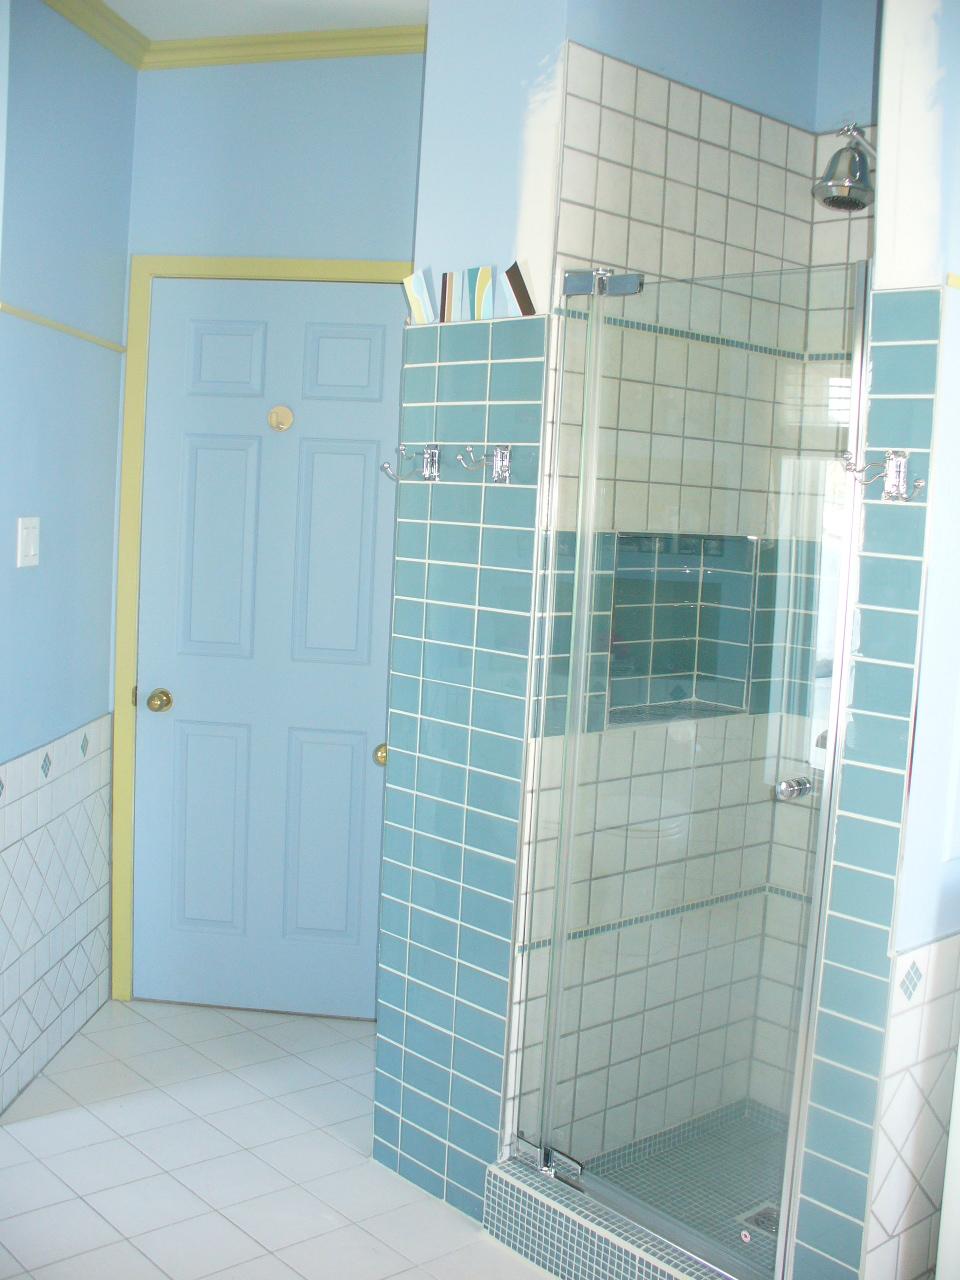 Carrelage salle de bain 2 multi services ec for Changer carrelage salle de bain